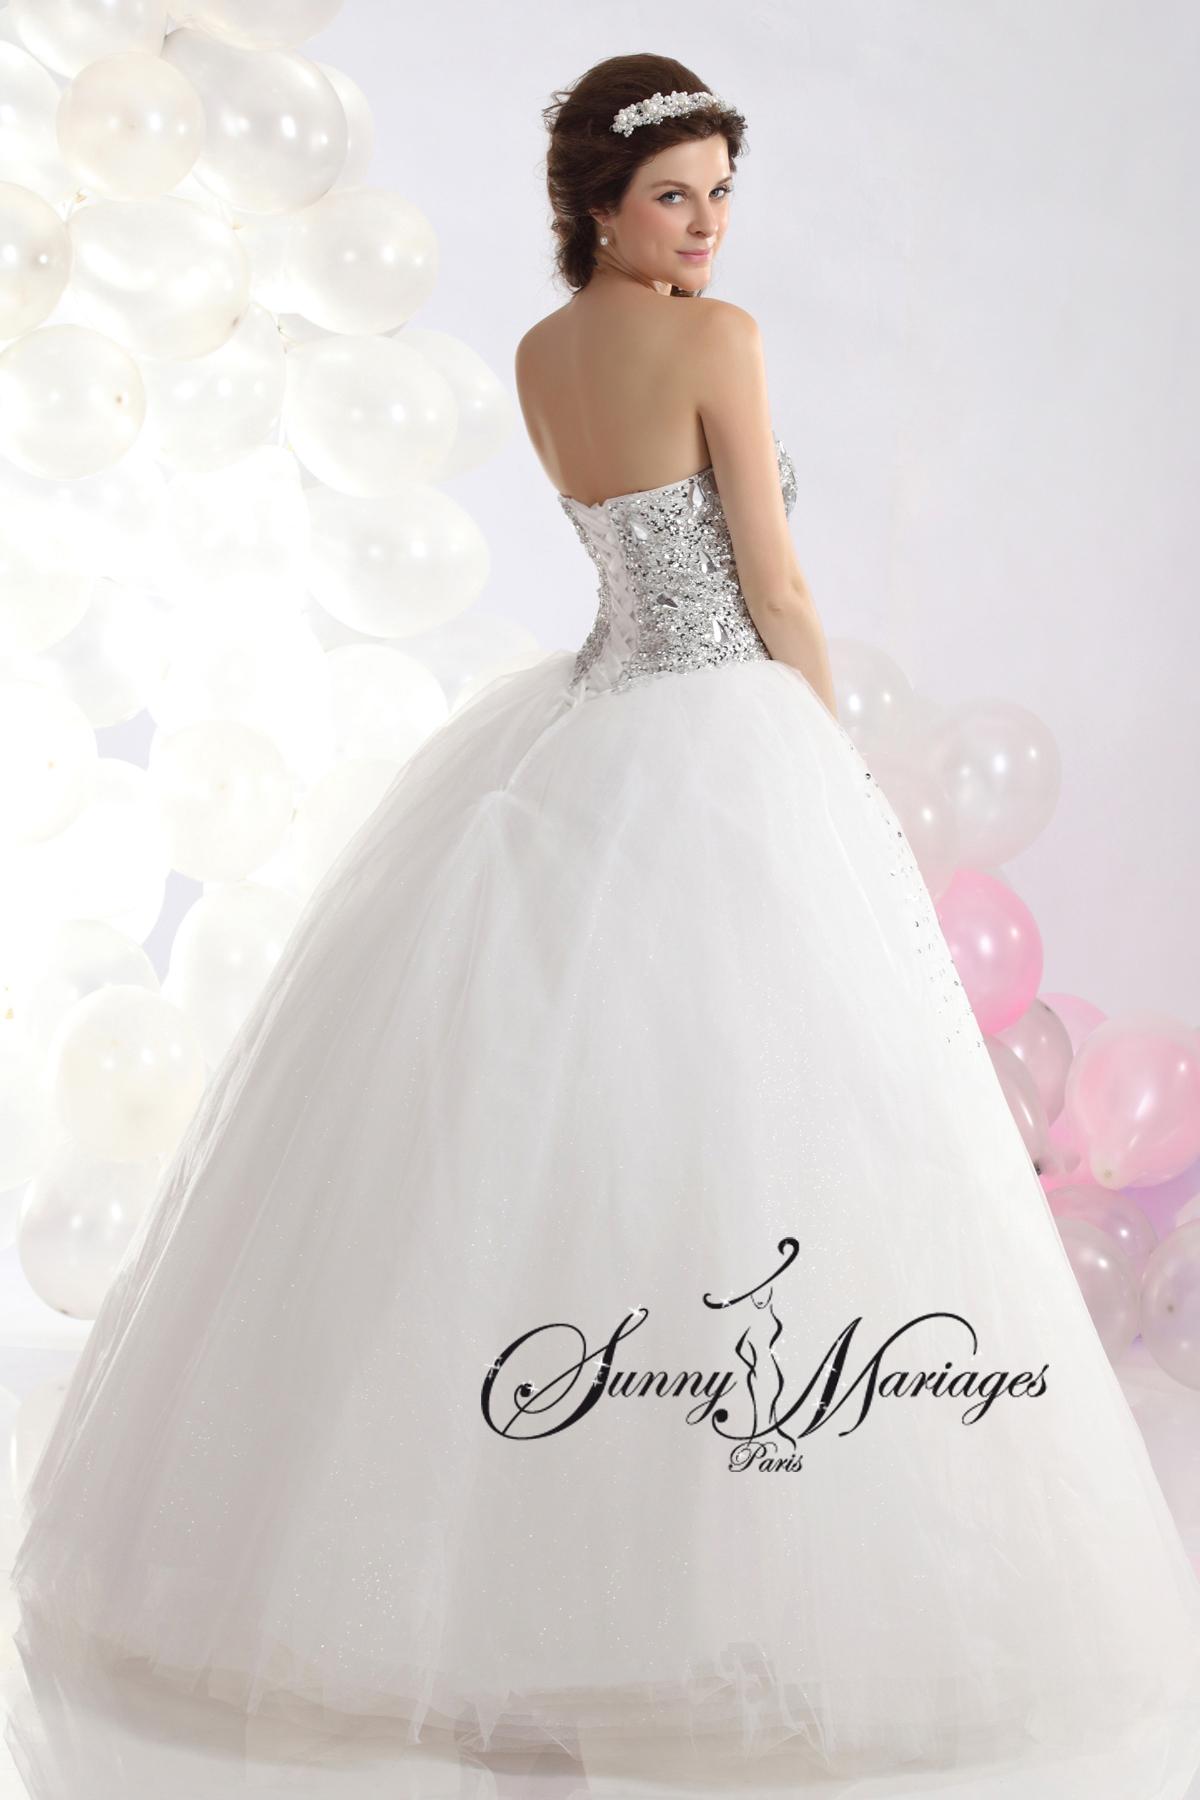 Robe de mariage forme princesse blanche avec bustier coeur et sunny mariage - Robe de mariee strass ...